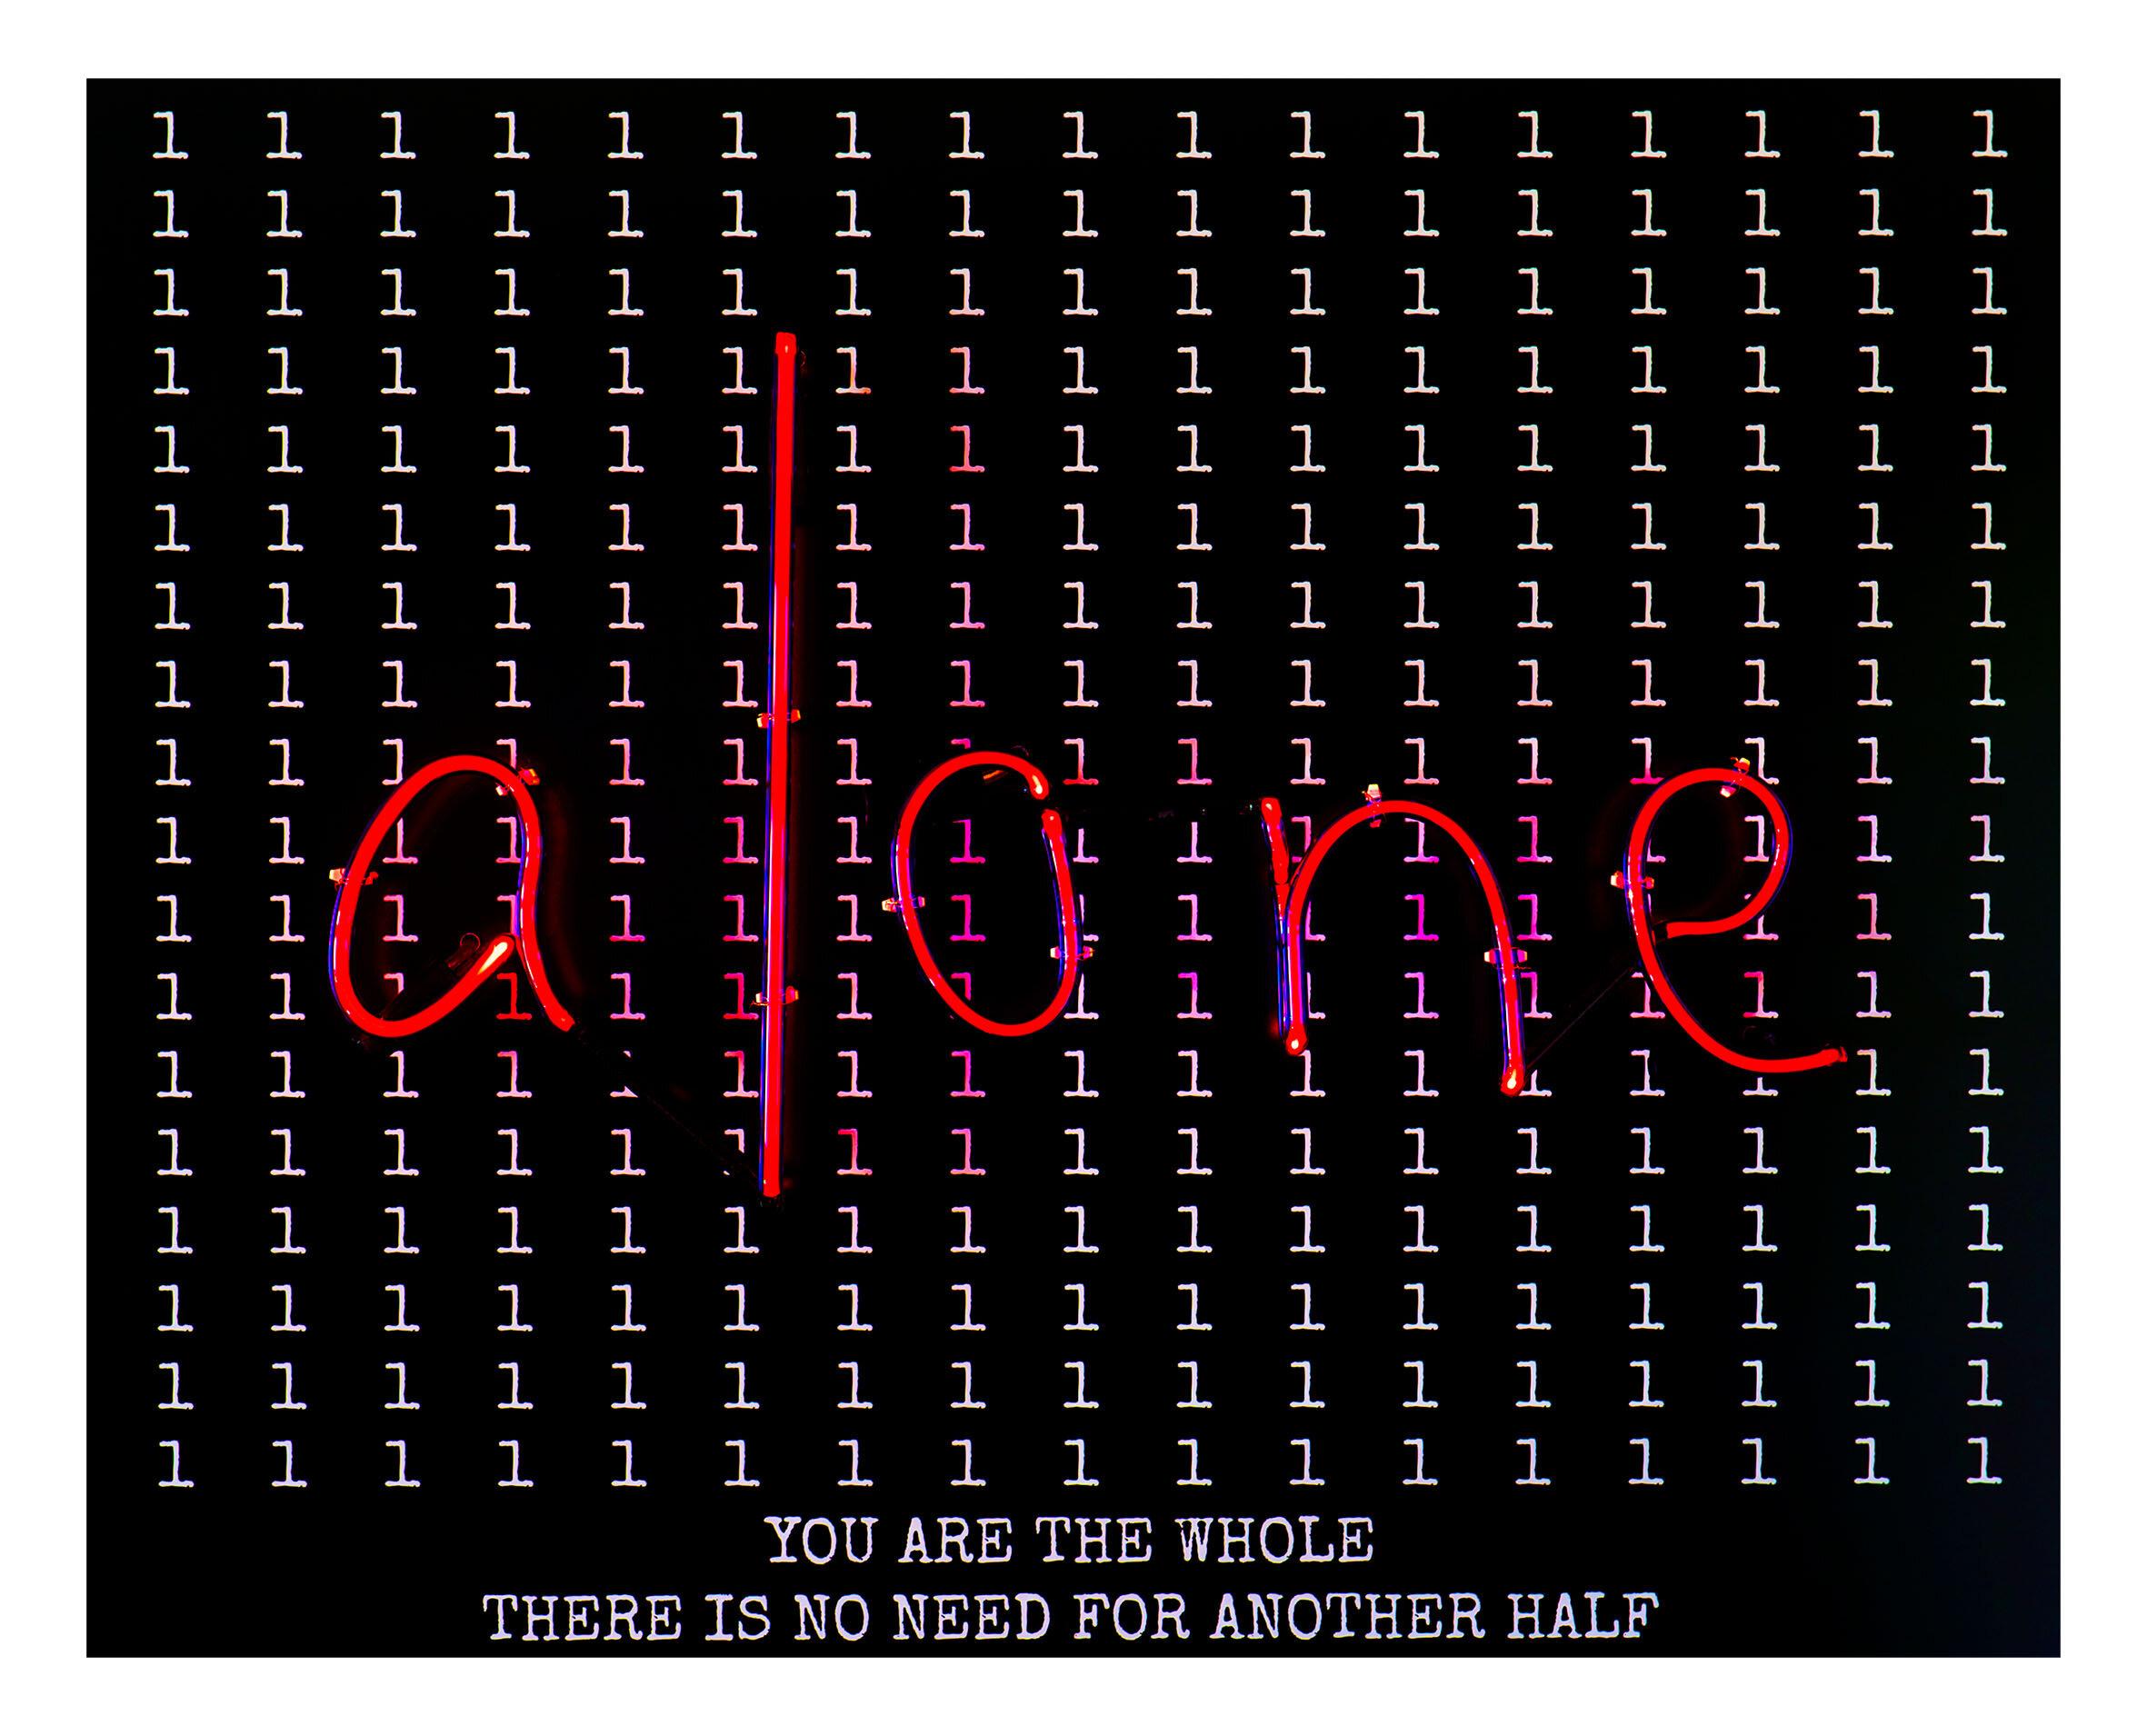 alone print mock up for web 2019.jpg